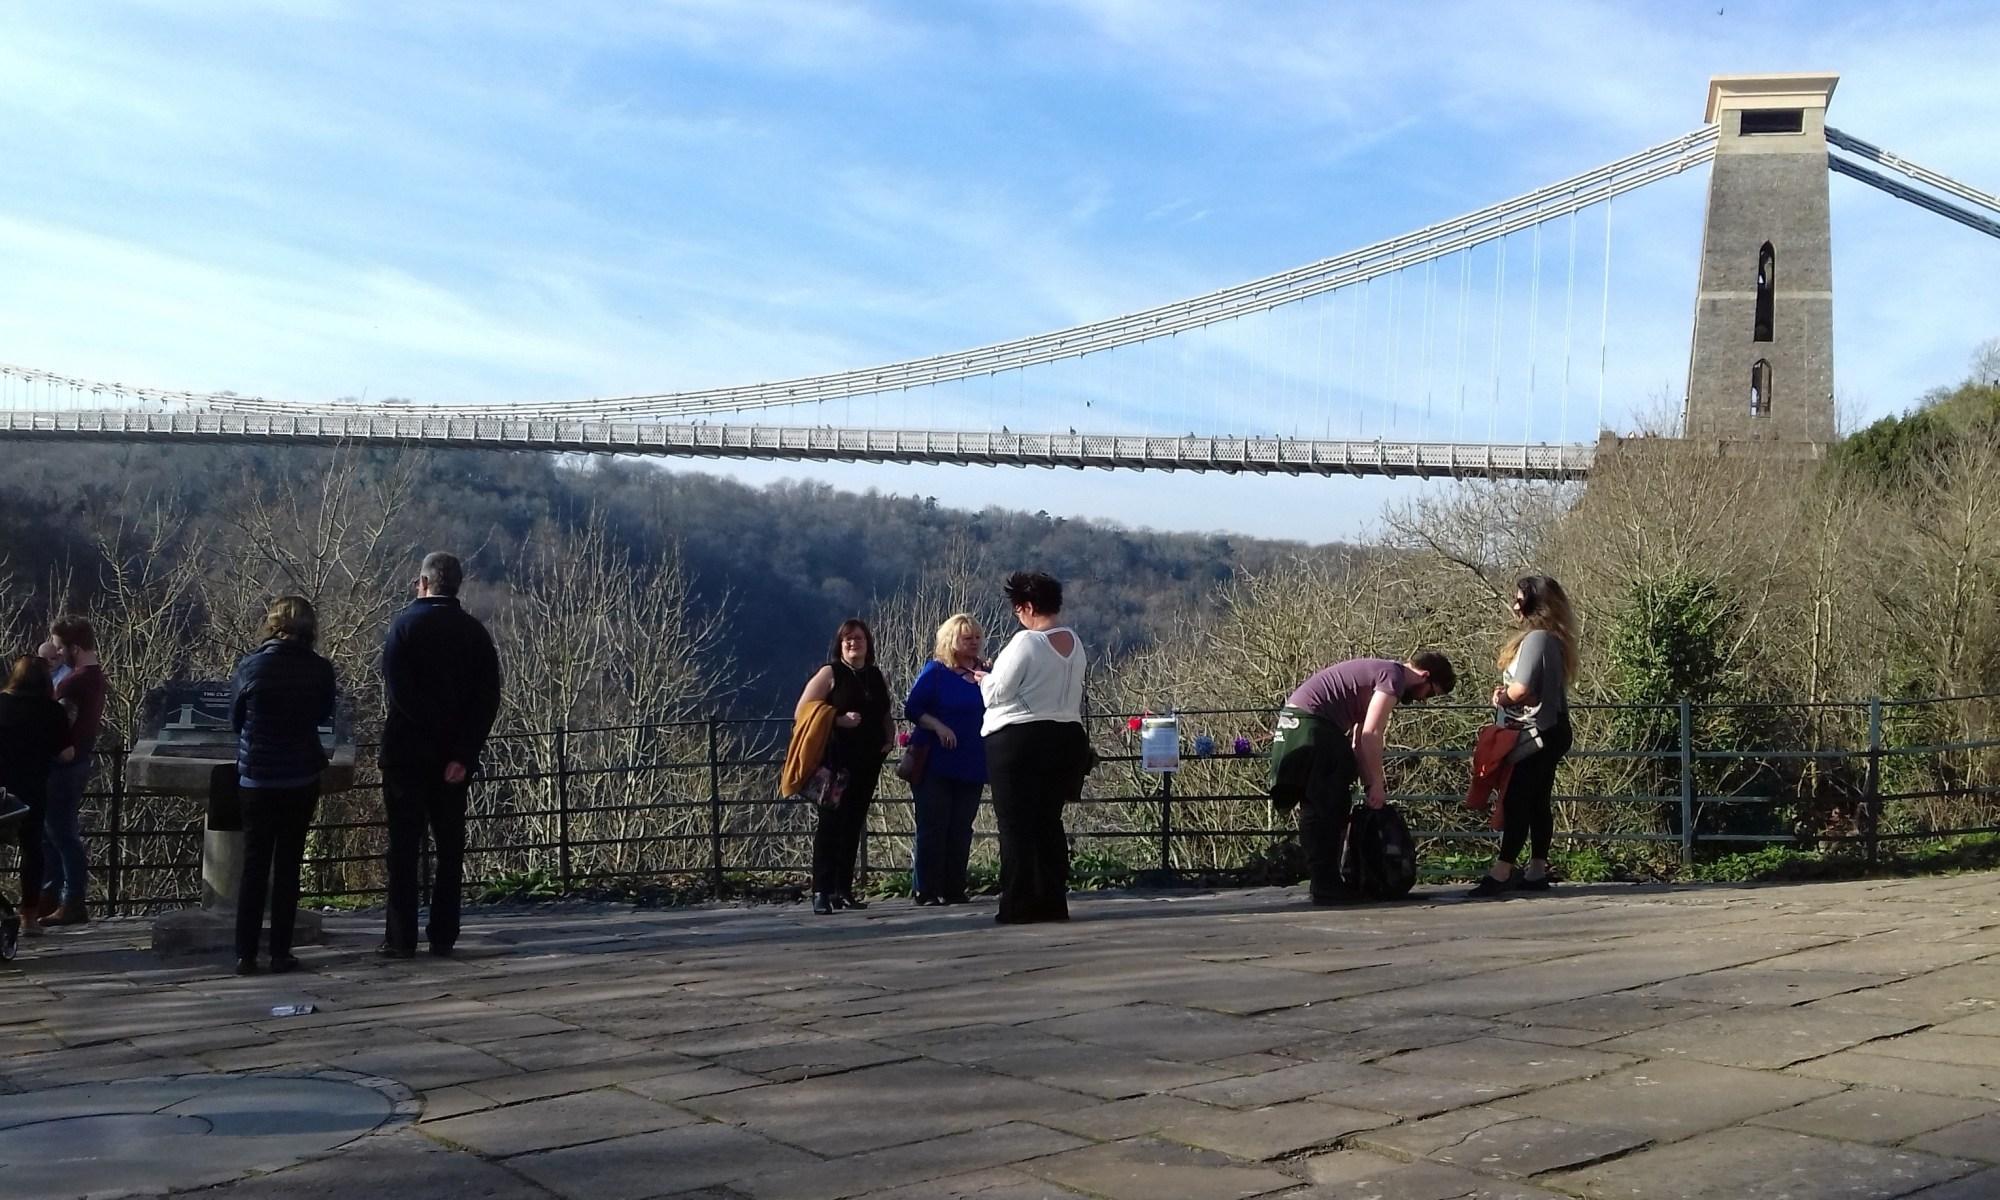 People looking at the suspension bridge